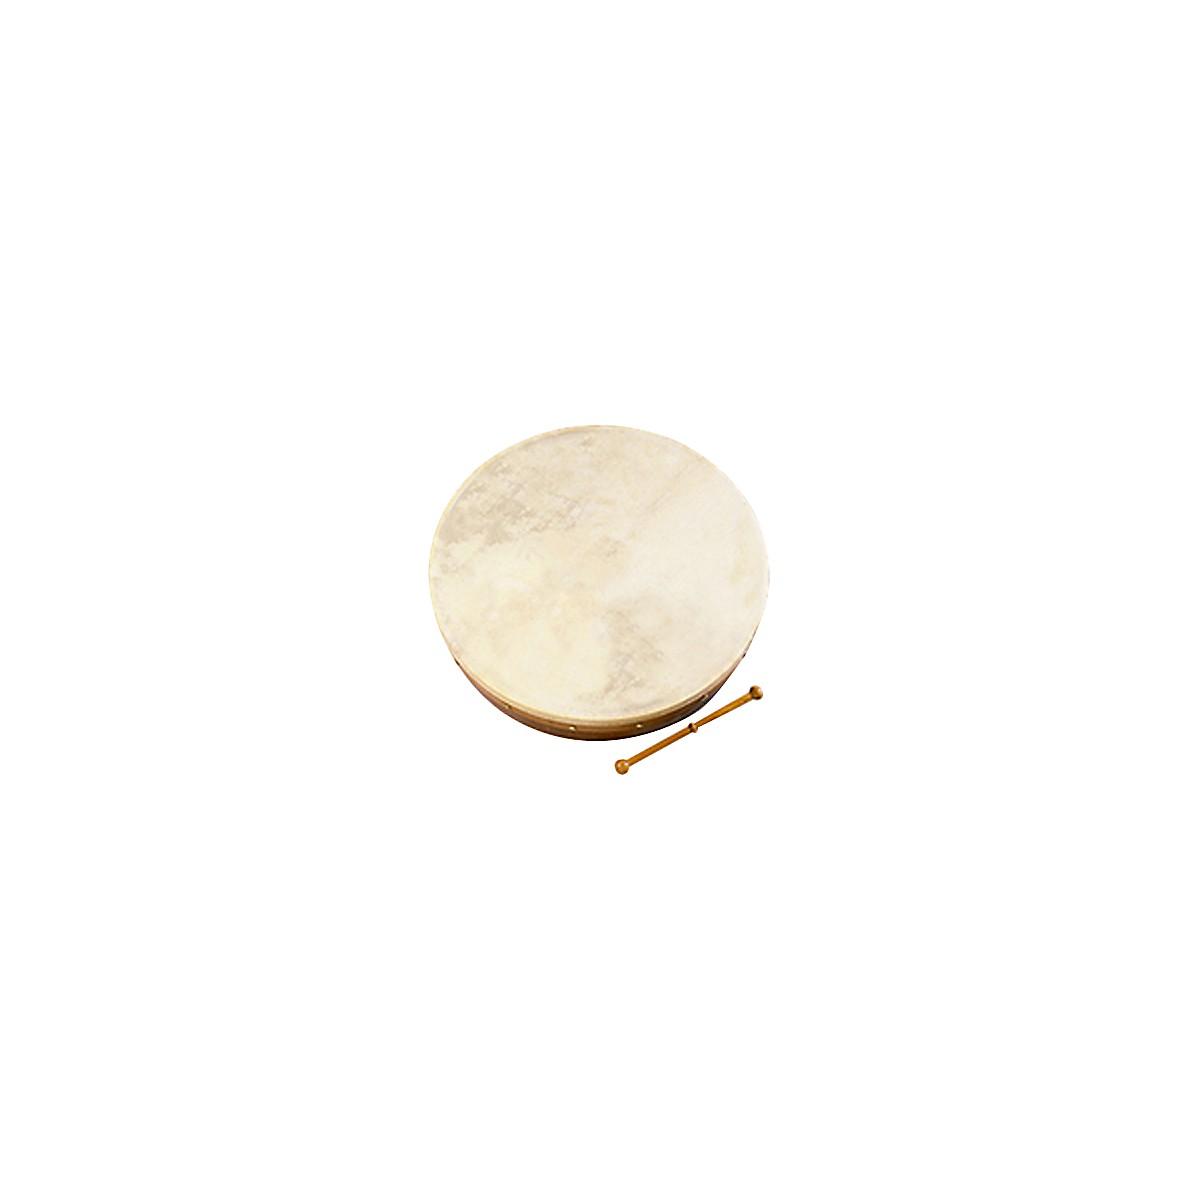 Waltons Bodhran WM1900 Irish Hand Drum